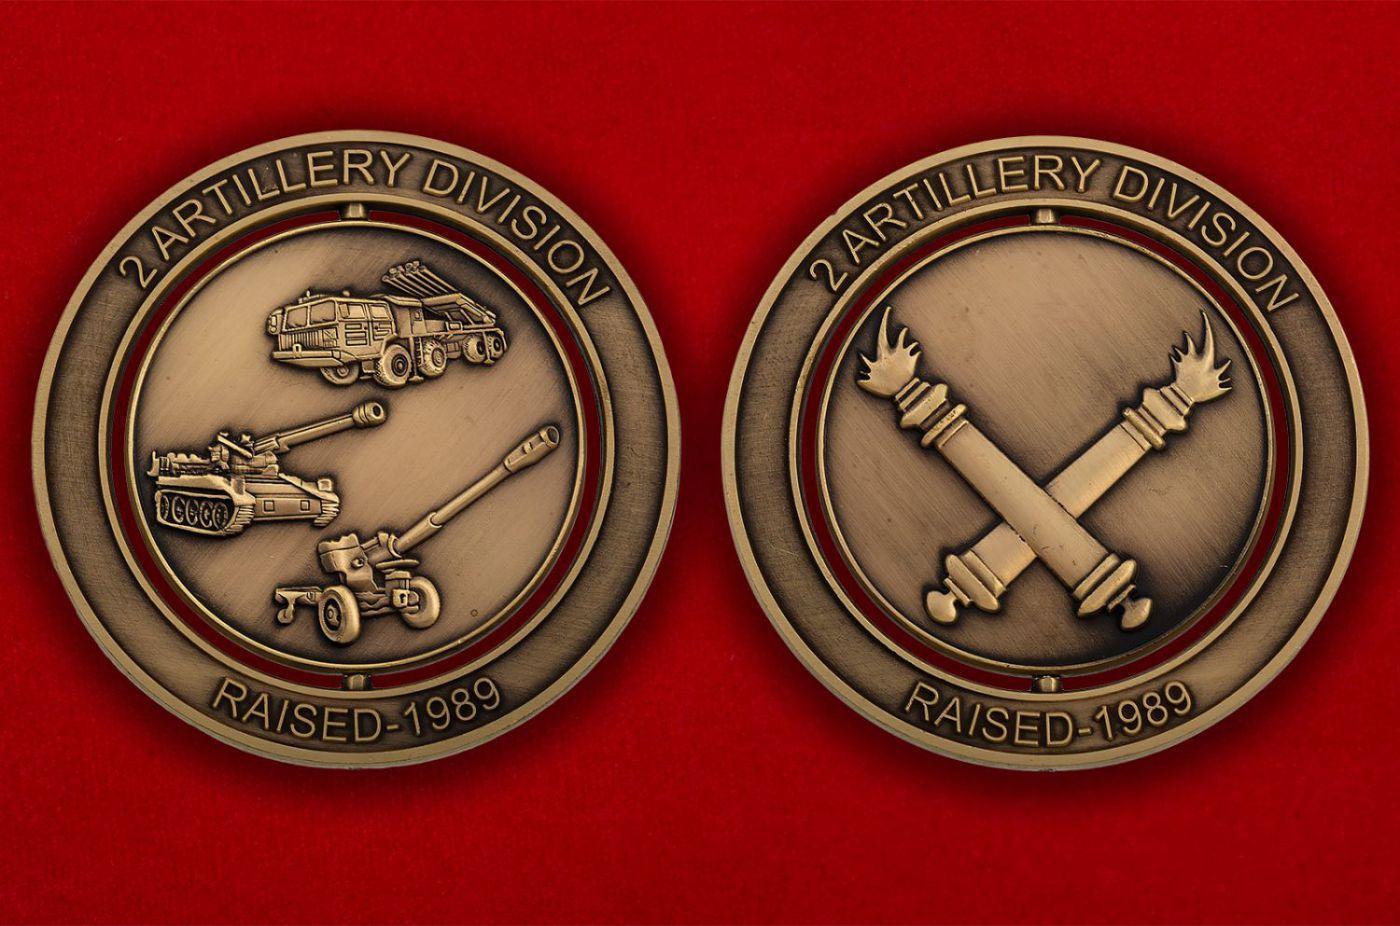 Челлендж коин 2-й Артиллерийской дивизии Армии Пакистана - аверс и реверс